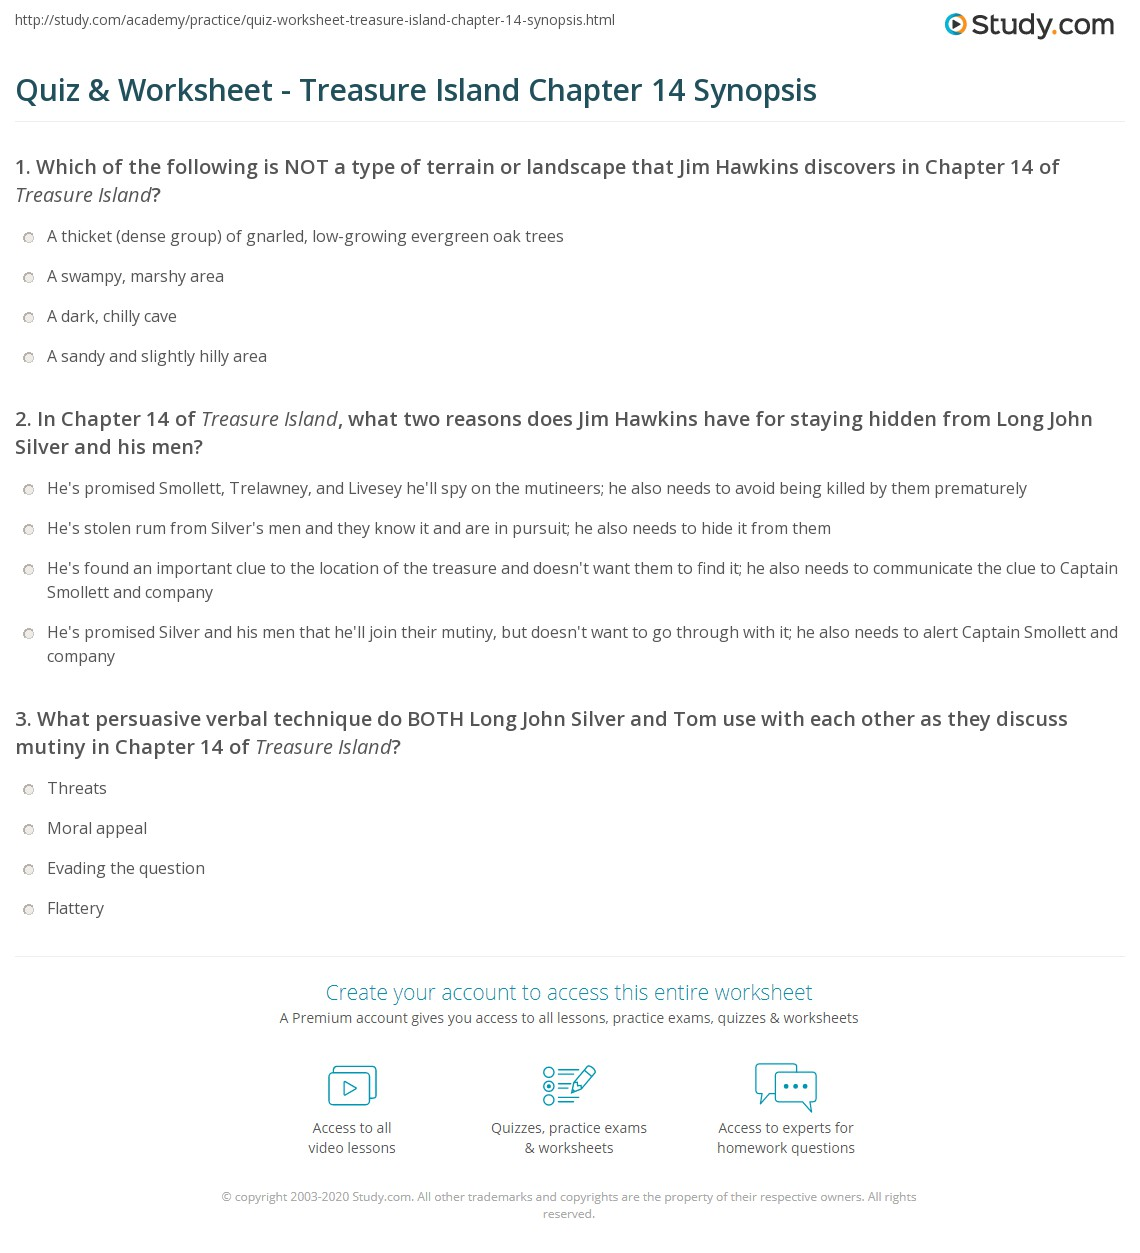 quiz worksheet treasure island chapter 14 synopsis. Black Bedroom Furniture Sets. Home Design Ideas